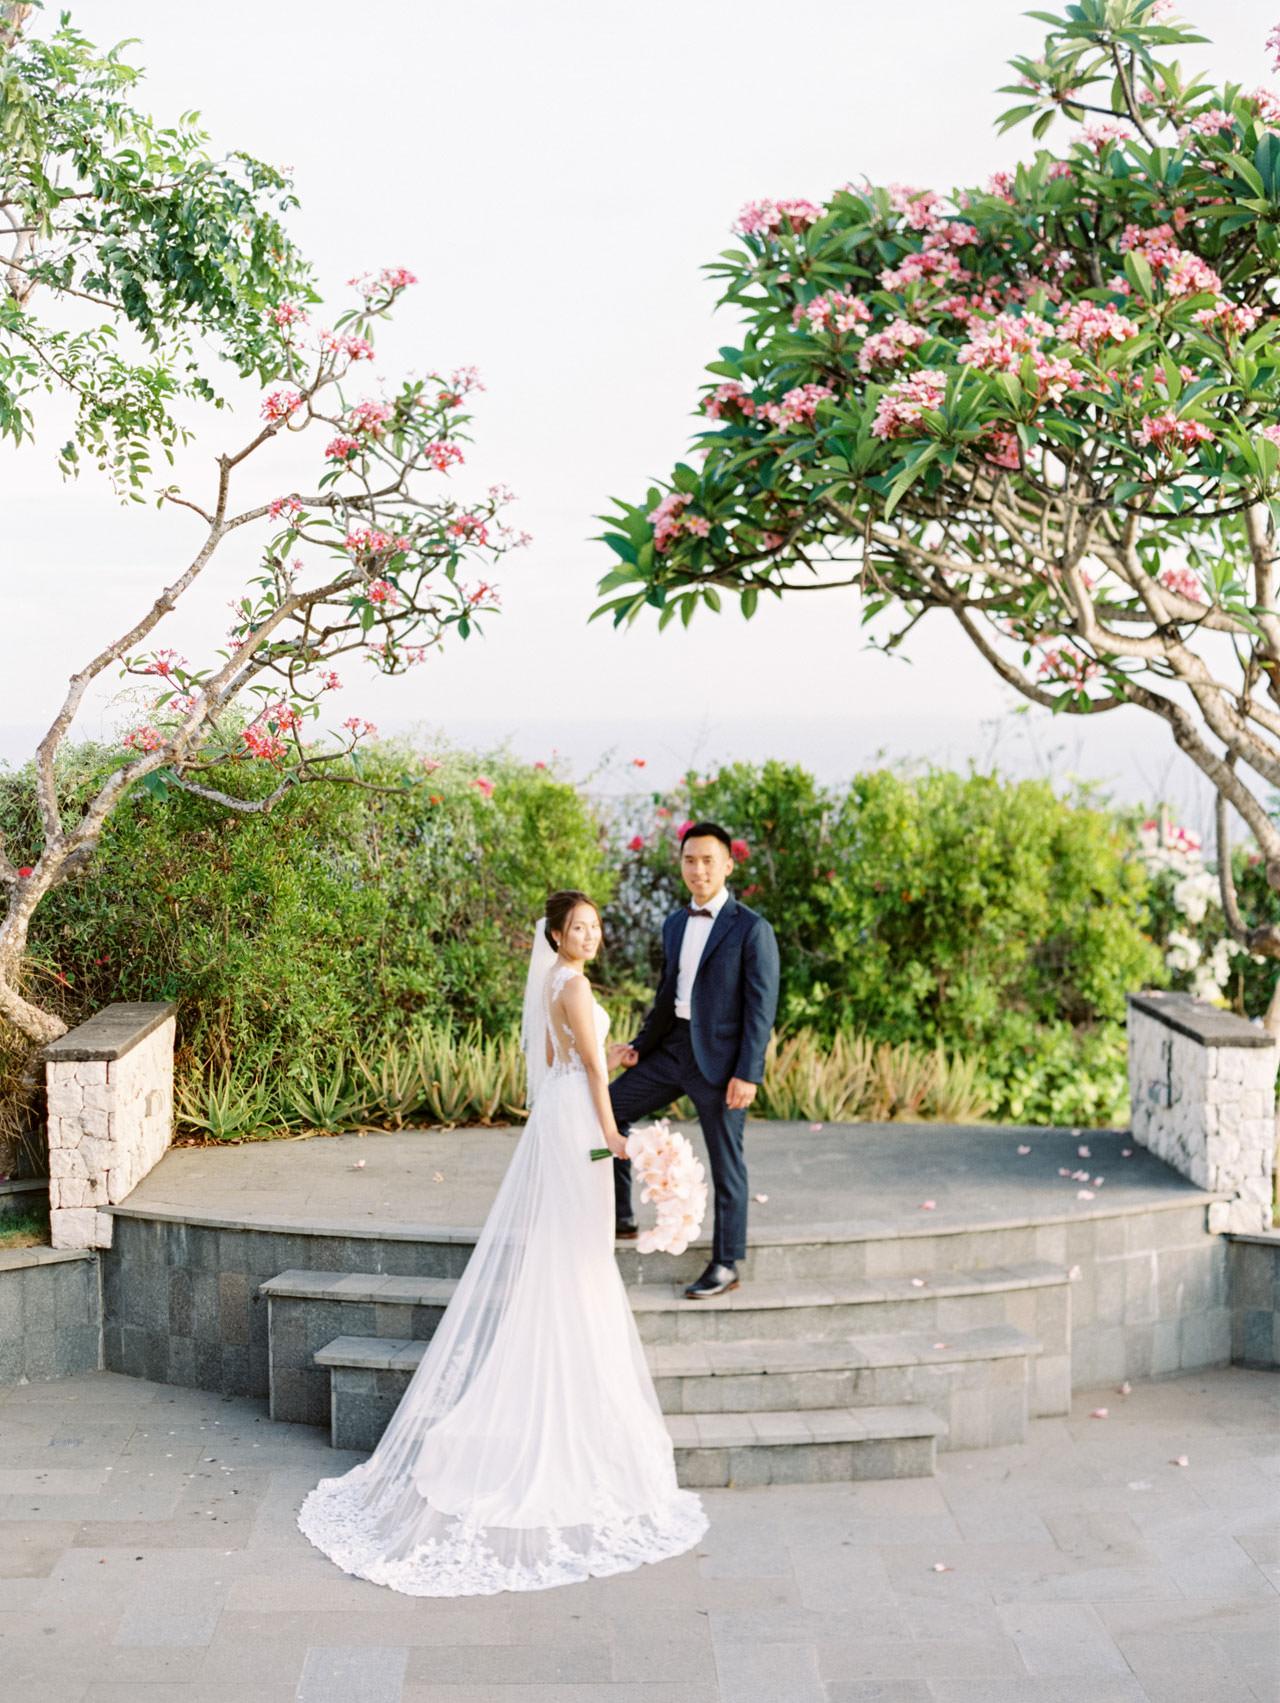 Uluwatu Cliff Wedding with Chinese Wedding Ceremony 33